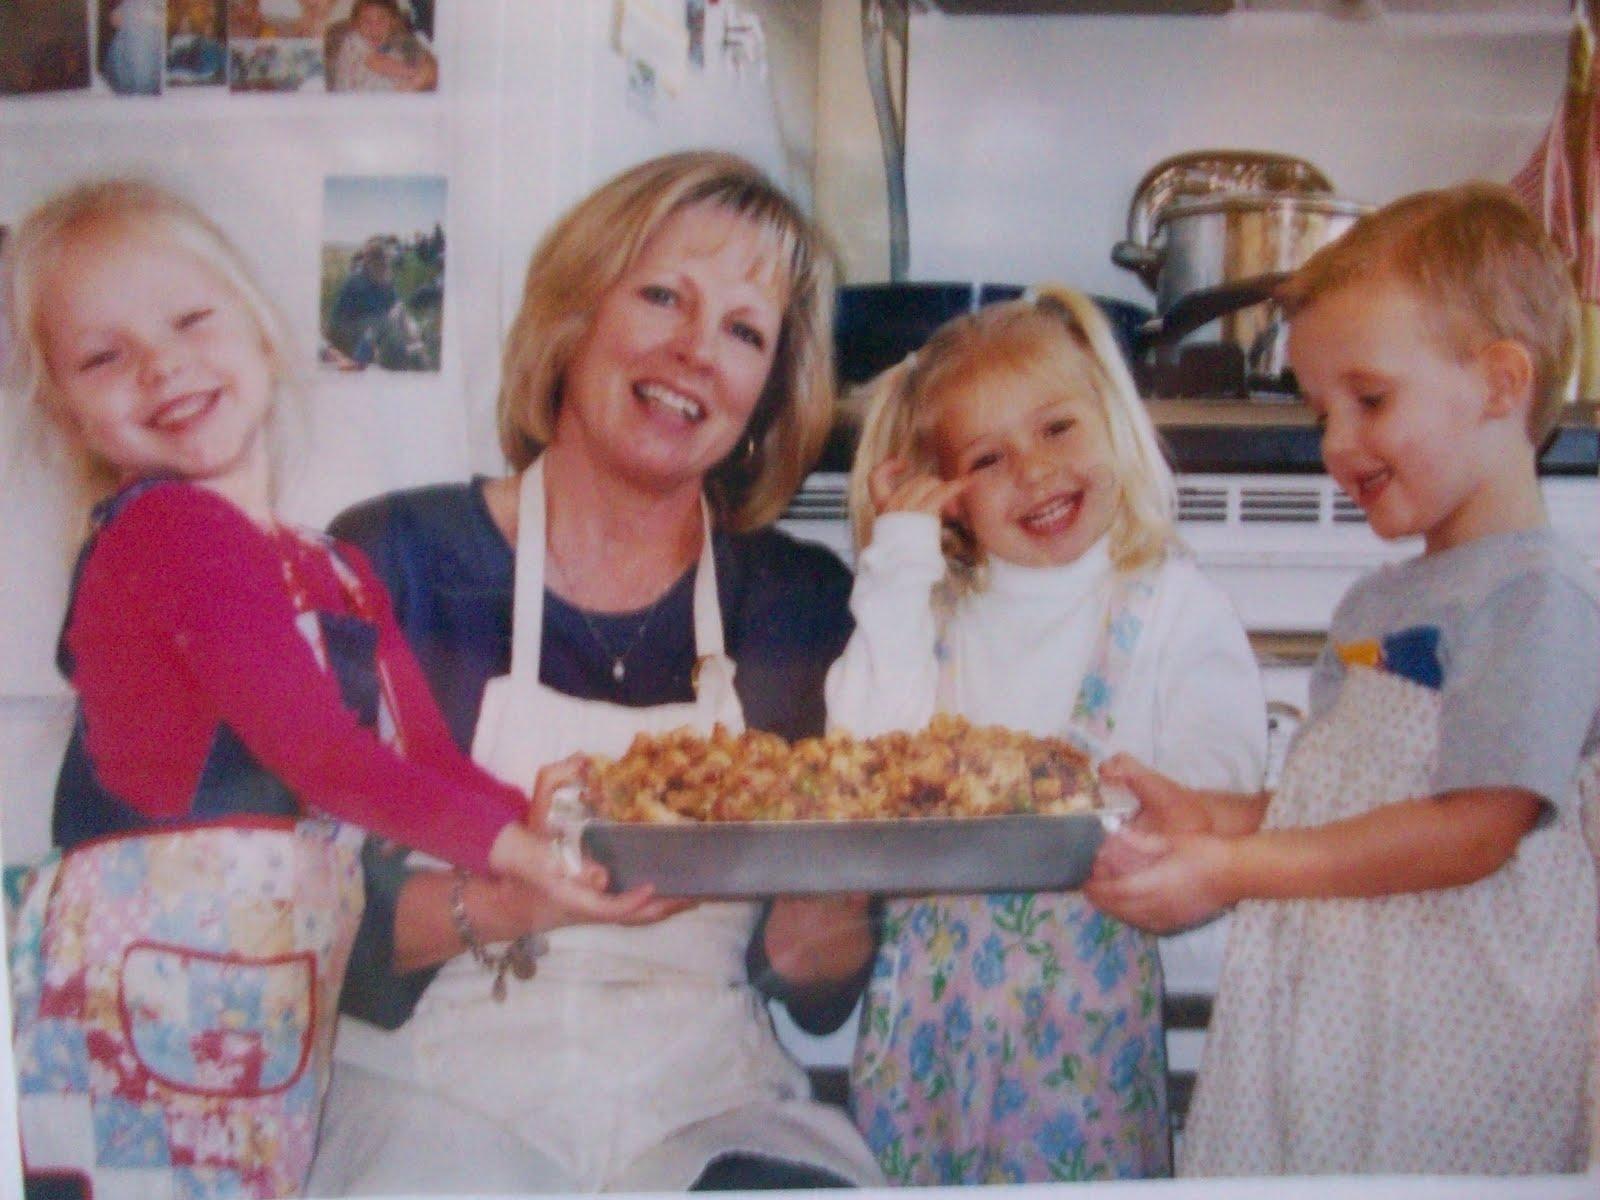 Fun in the kitchen!